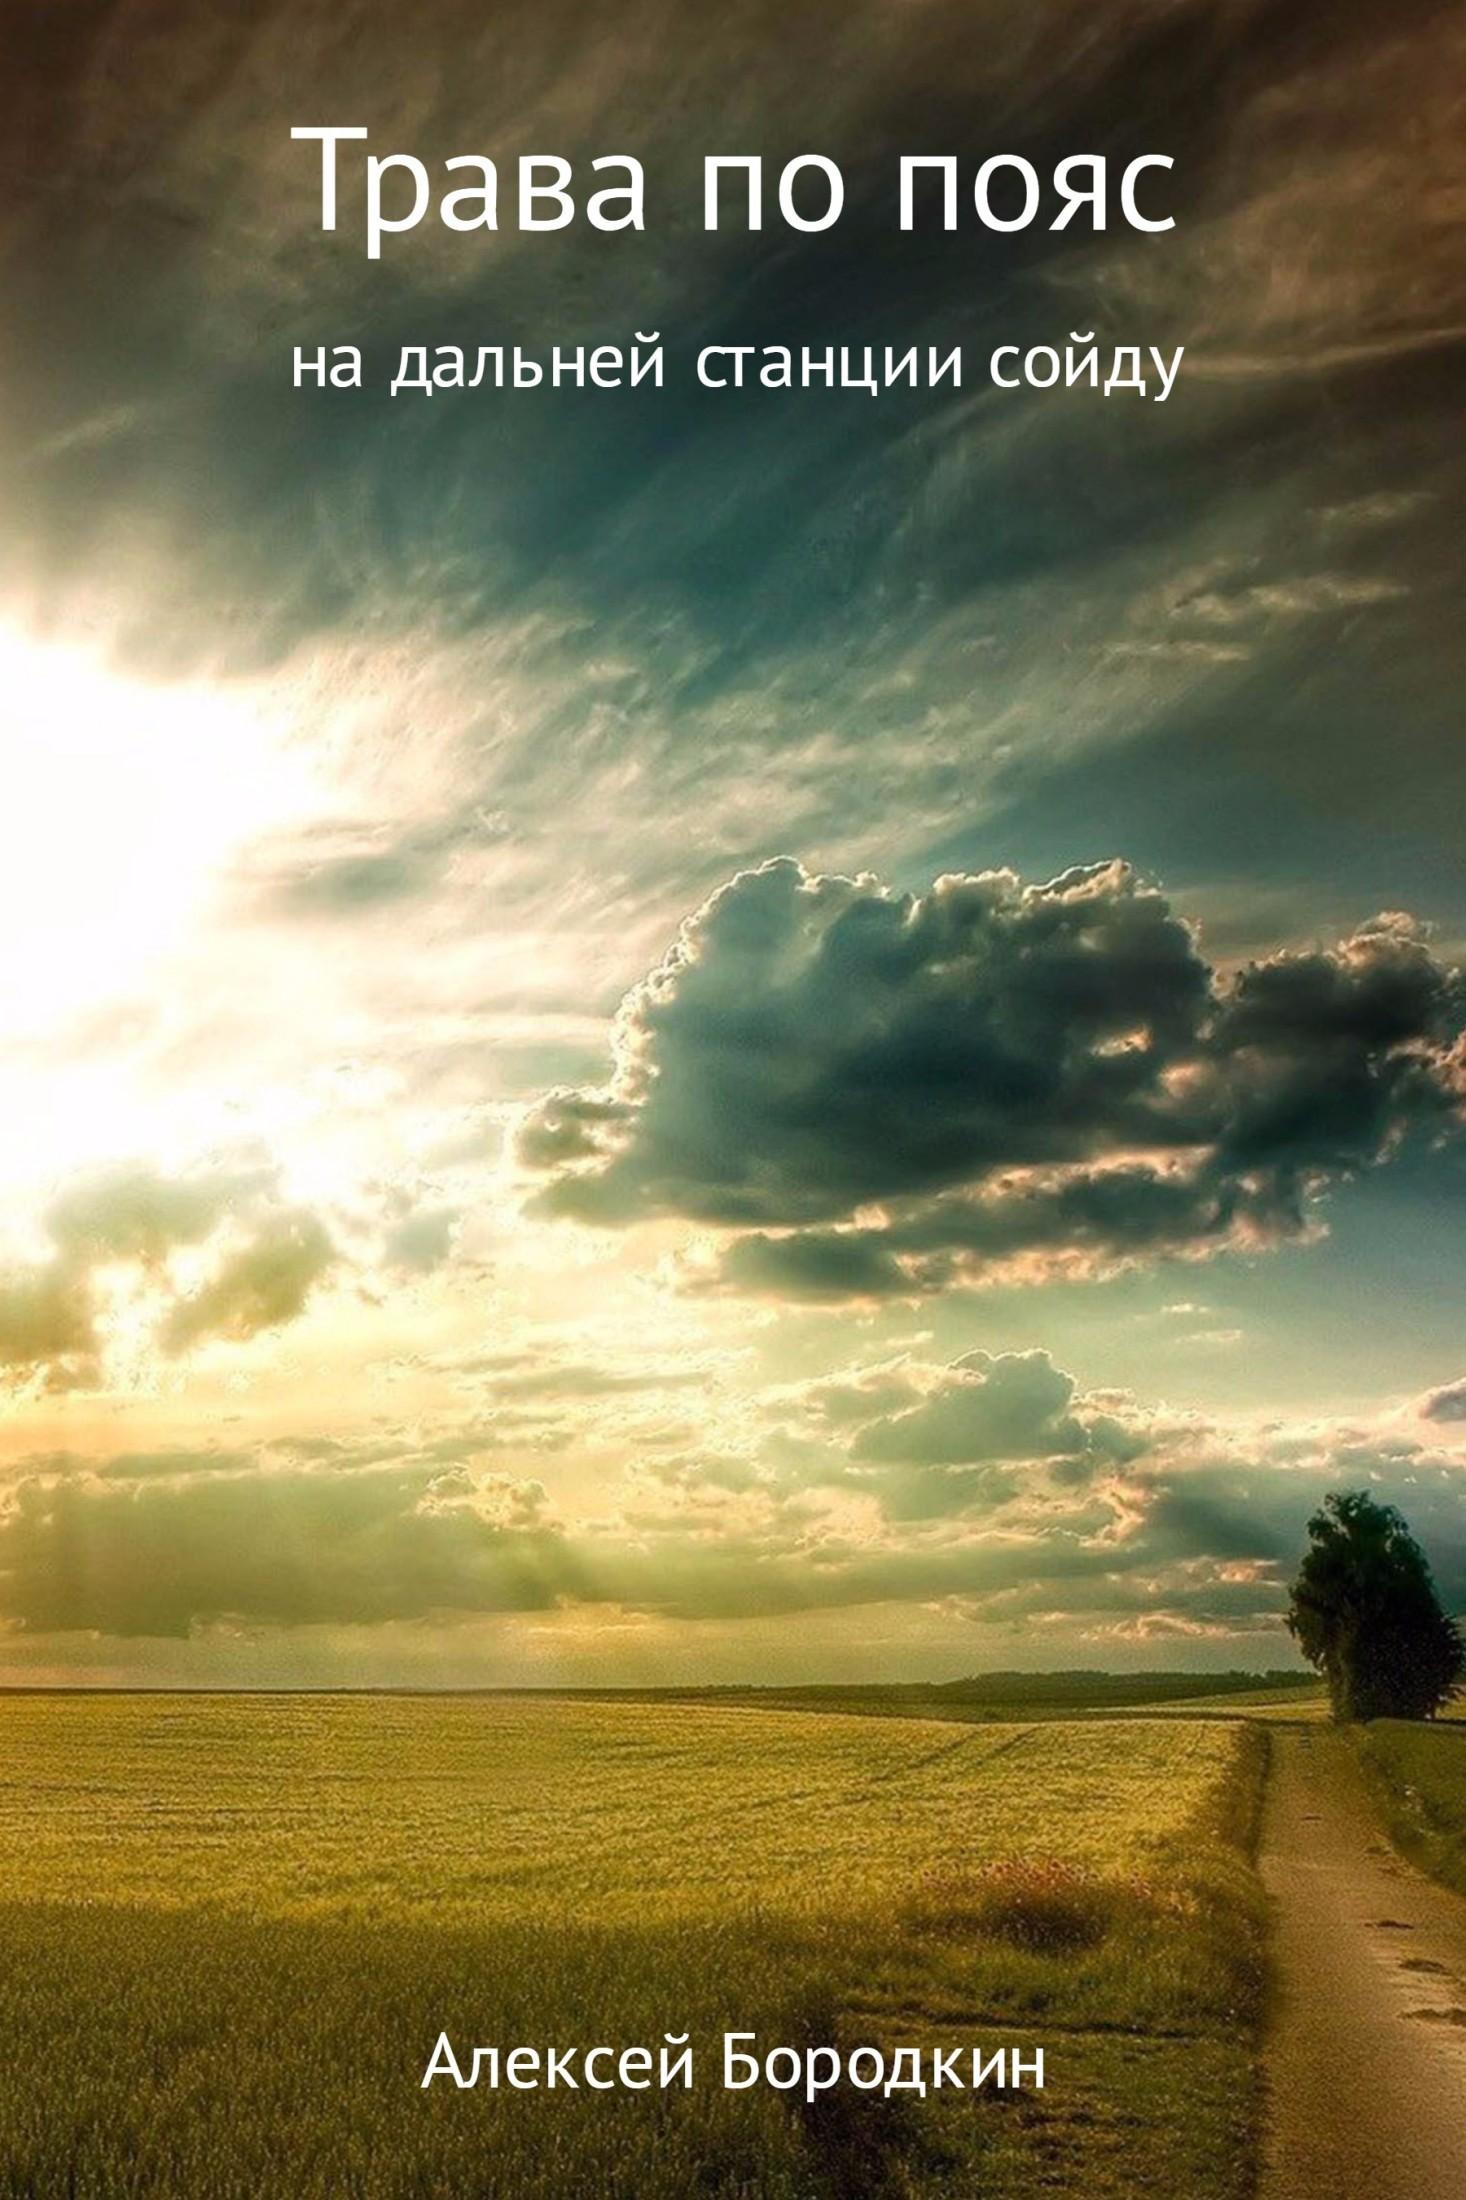 Купить книгу Трава по пояс, автора Алексея Петровича Бородкина